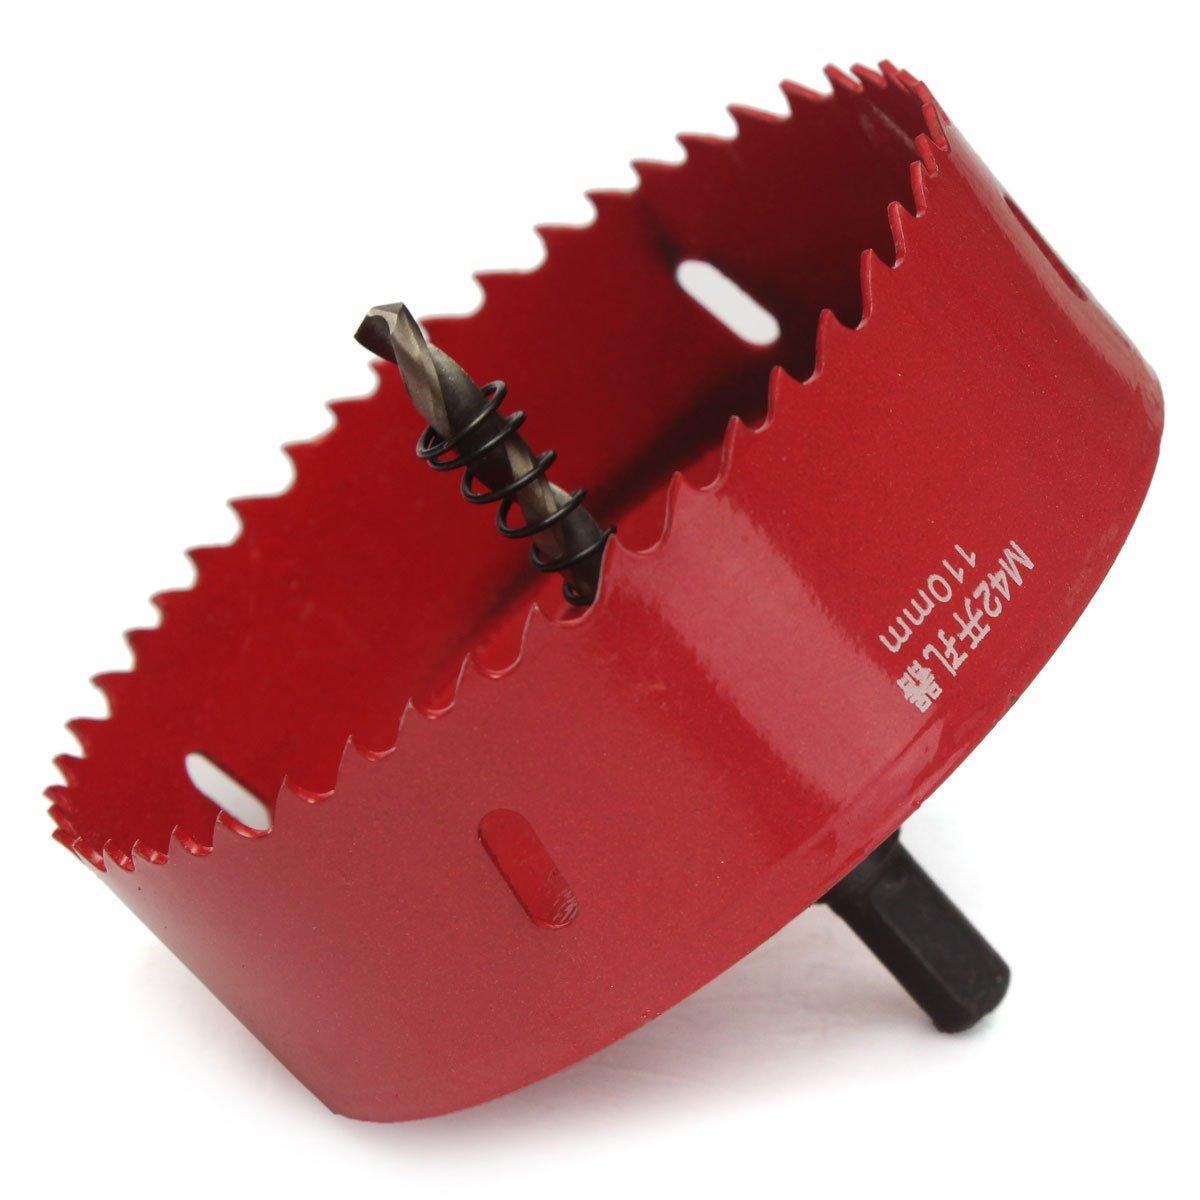 Punta bimetallica 170 mm Ferro 110-200 mm 180 mm HSS Legno Sega a Tazza per Alluminio Terrarum M42